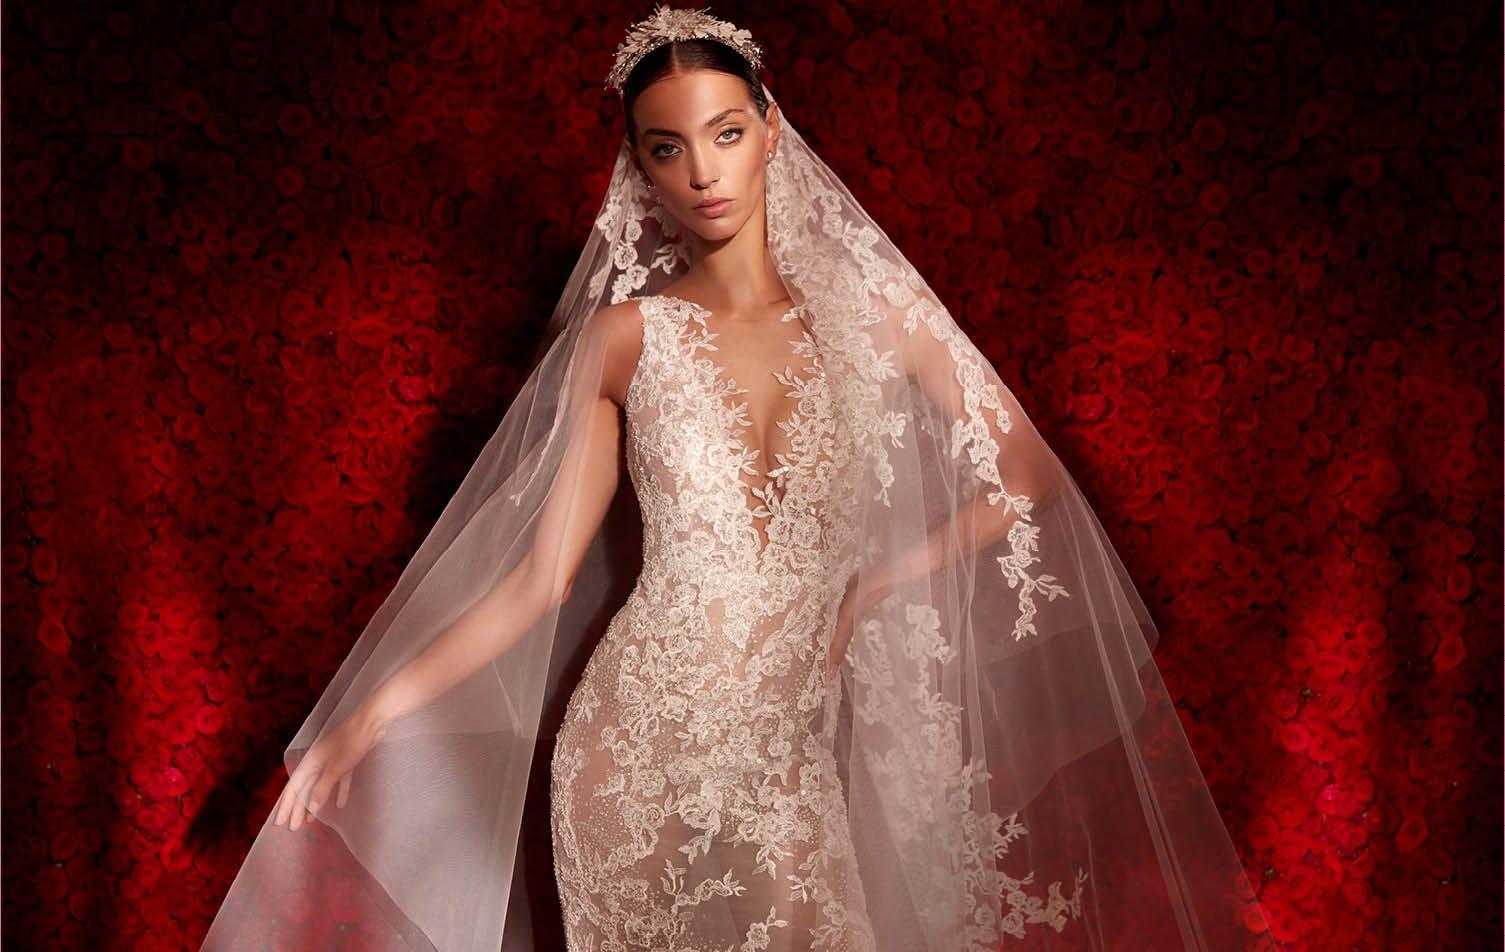 Atelier Pronovias 2022. Die Kunst der Oper erobert die Brautmode